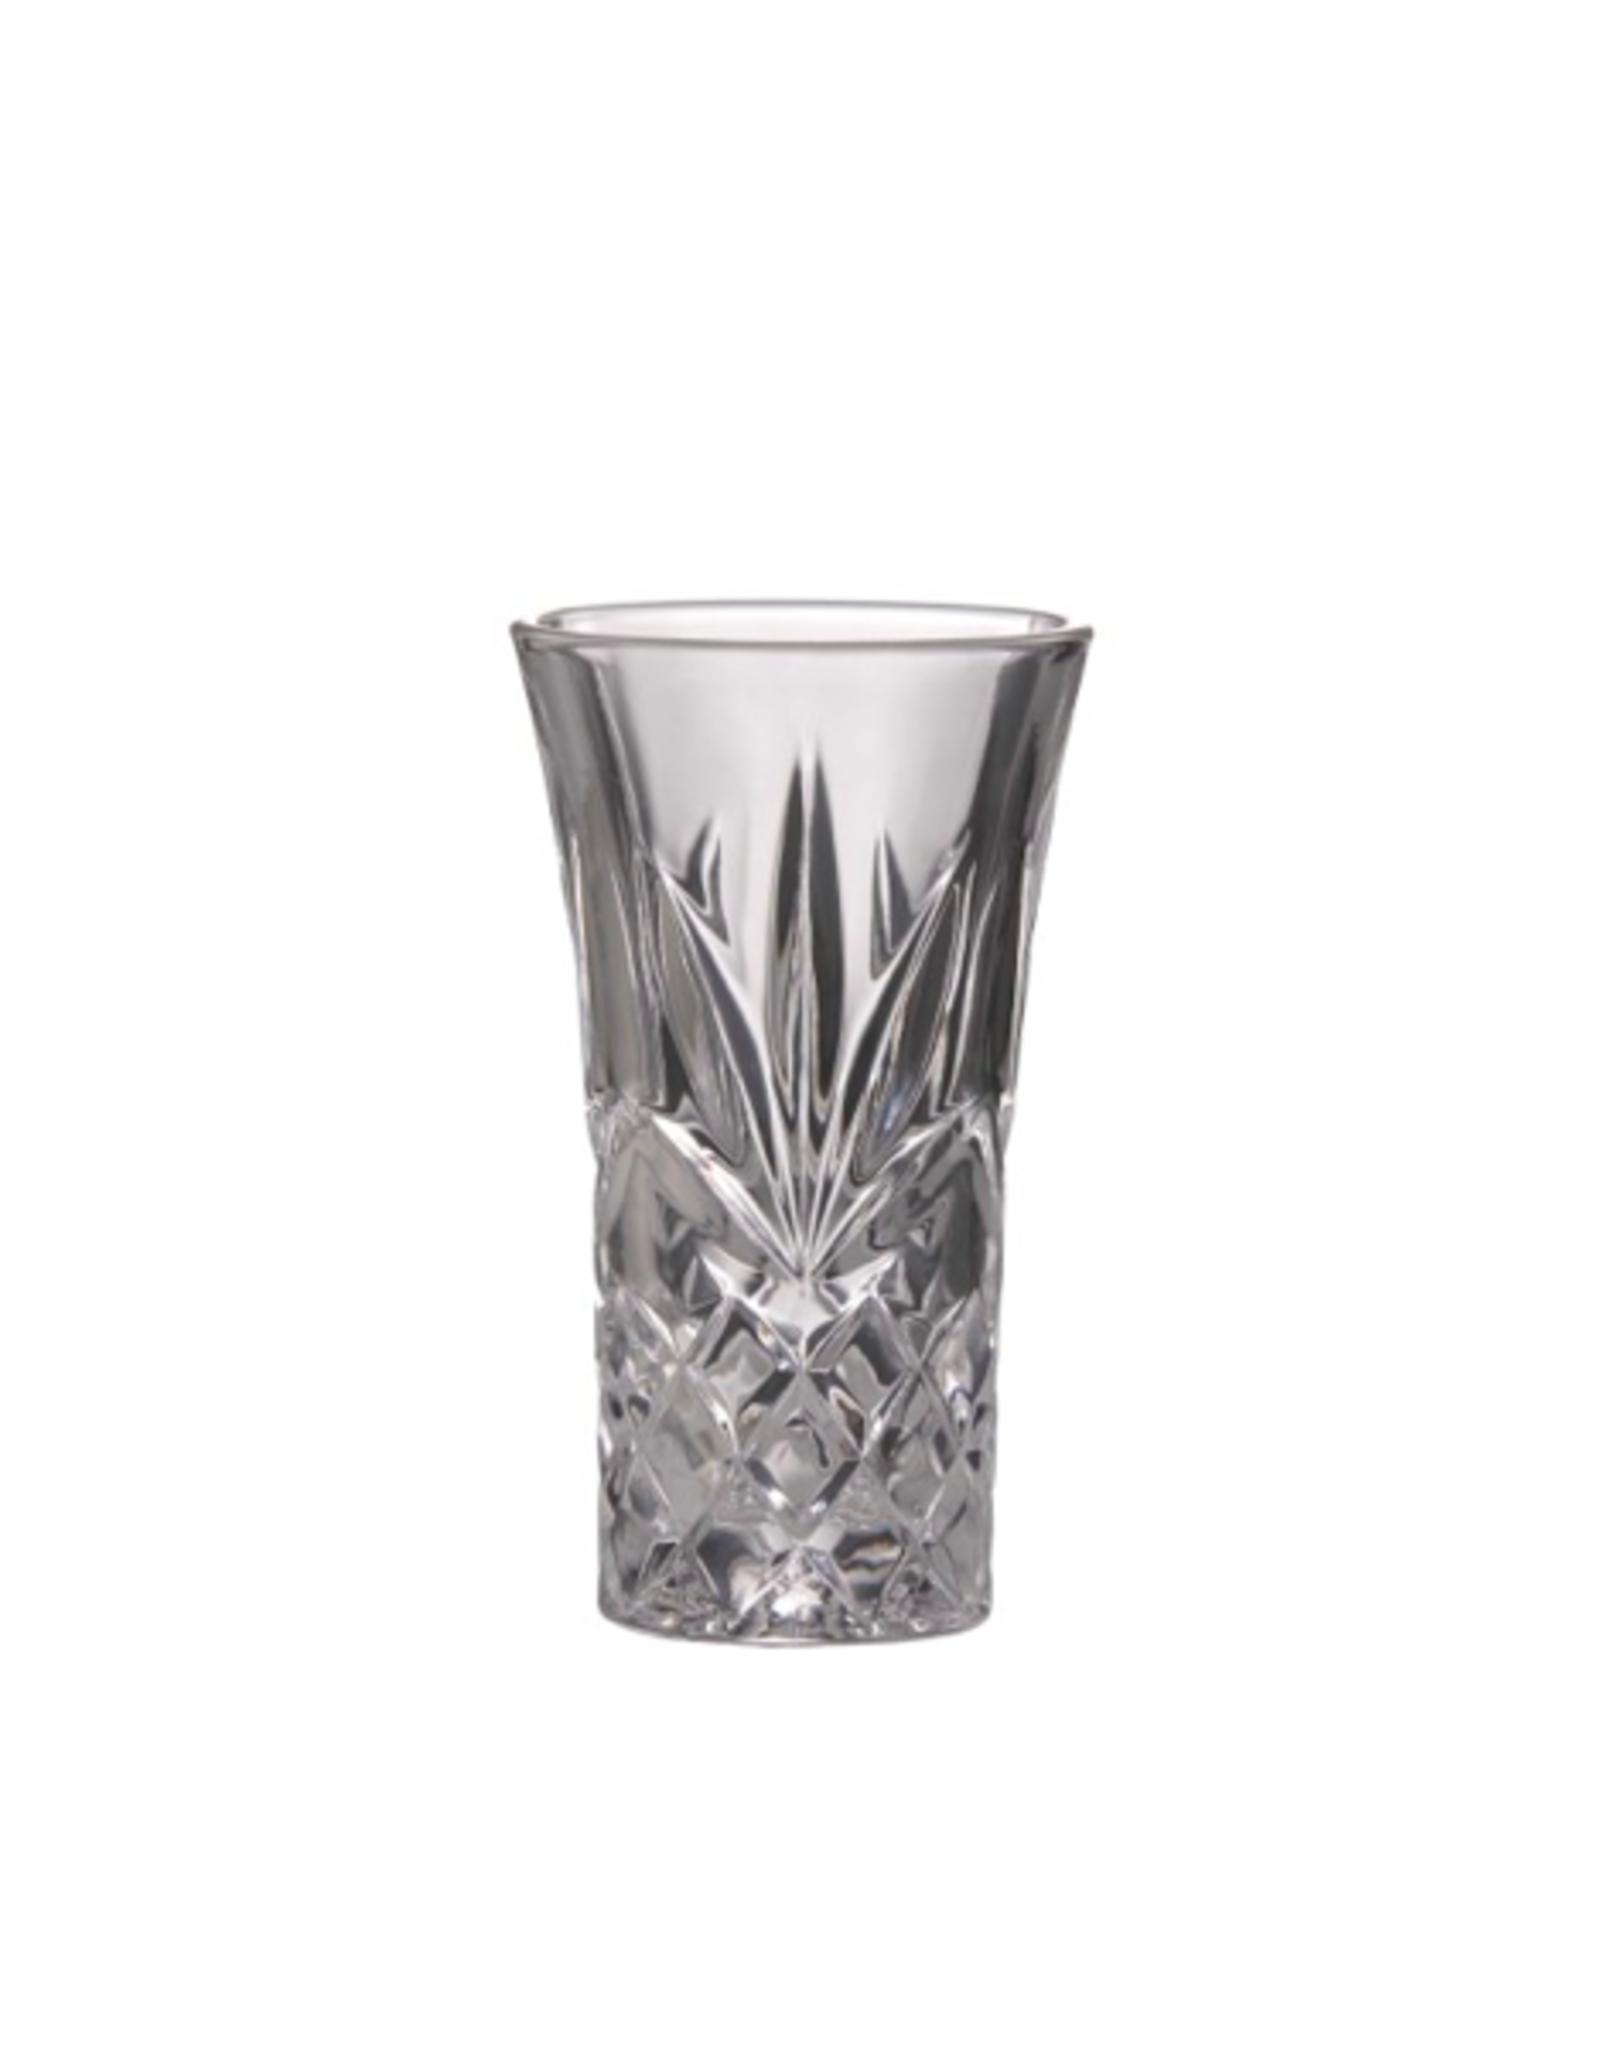 ICM - Shot Glass/Nell's, 2oz